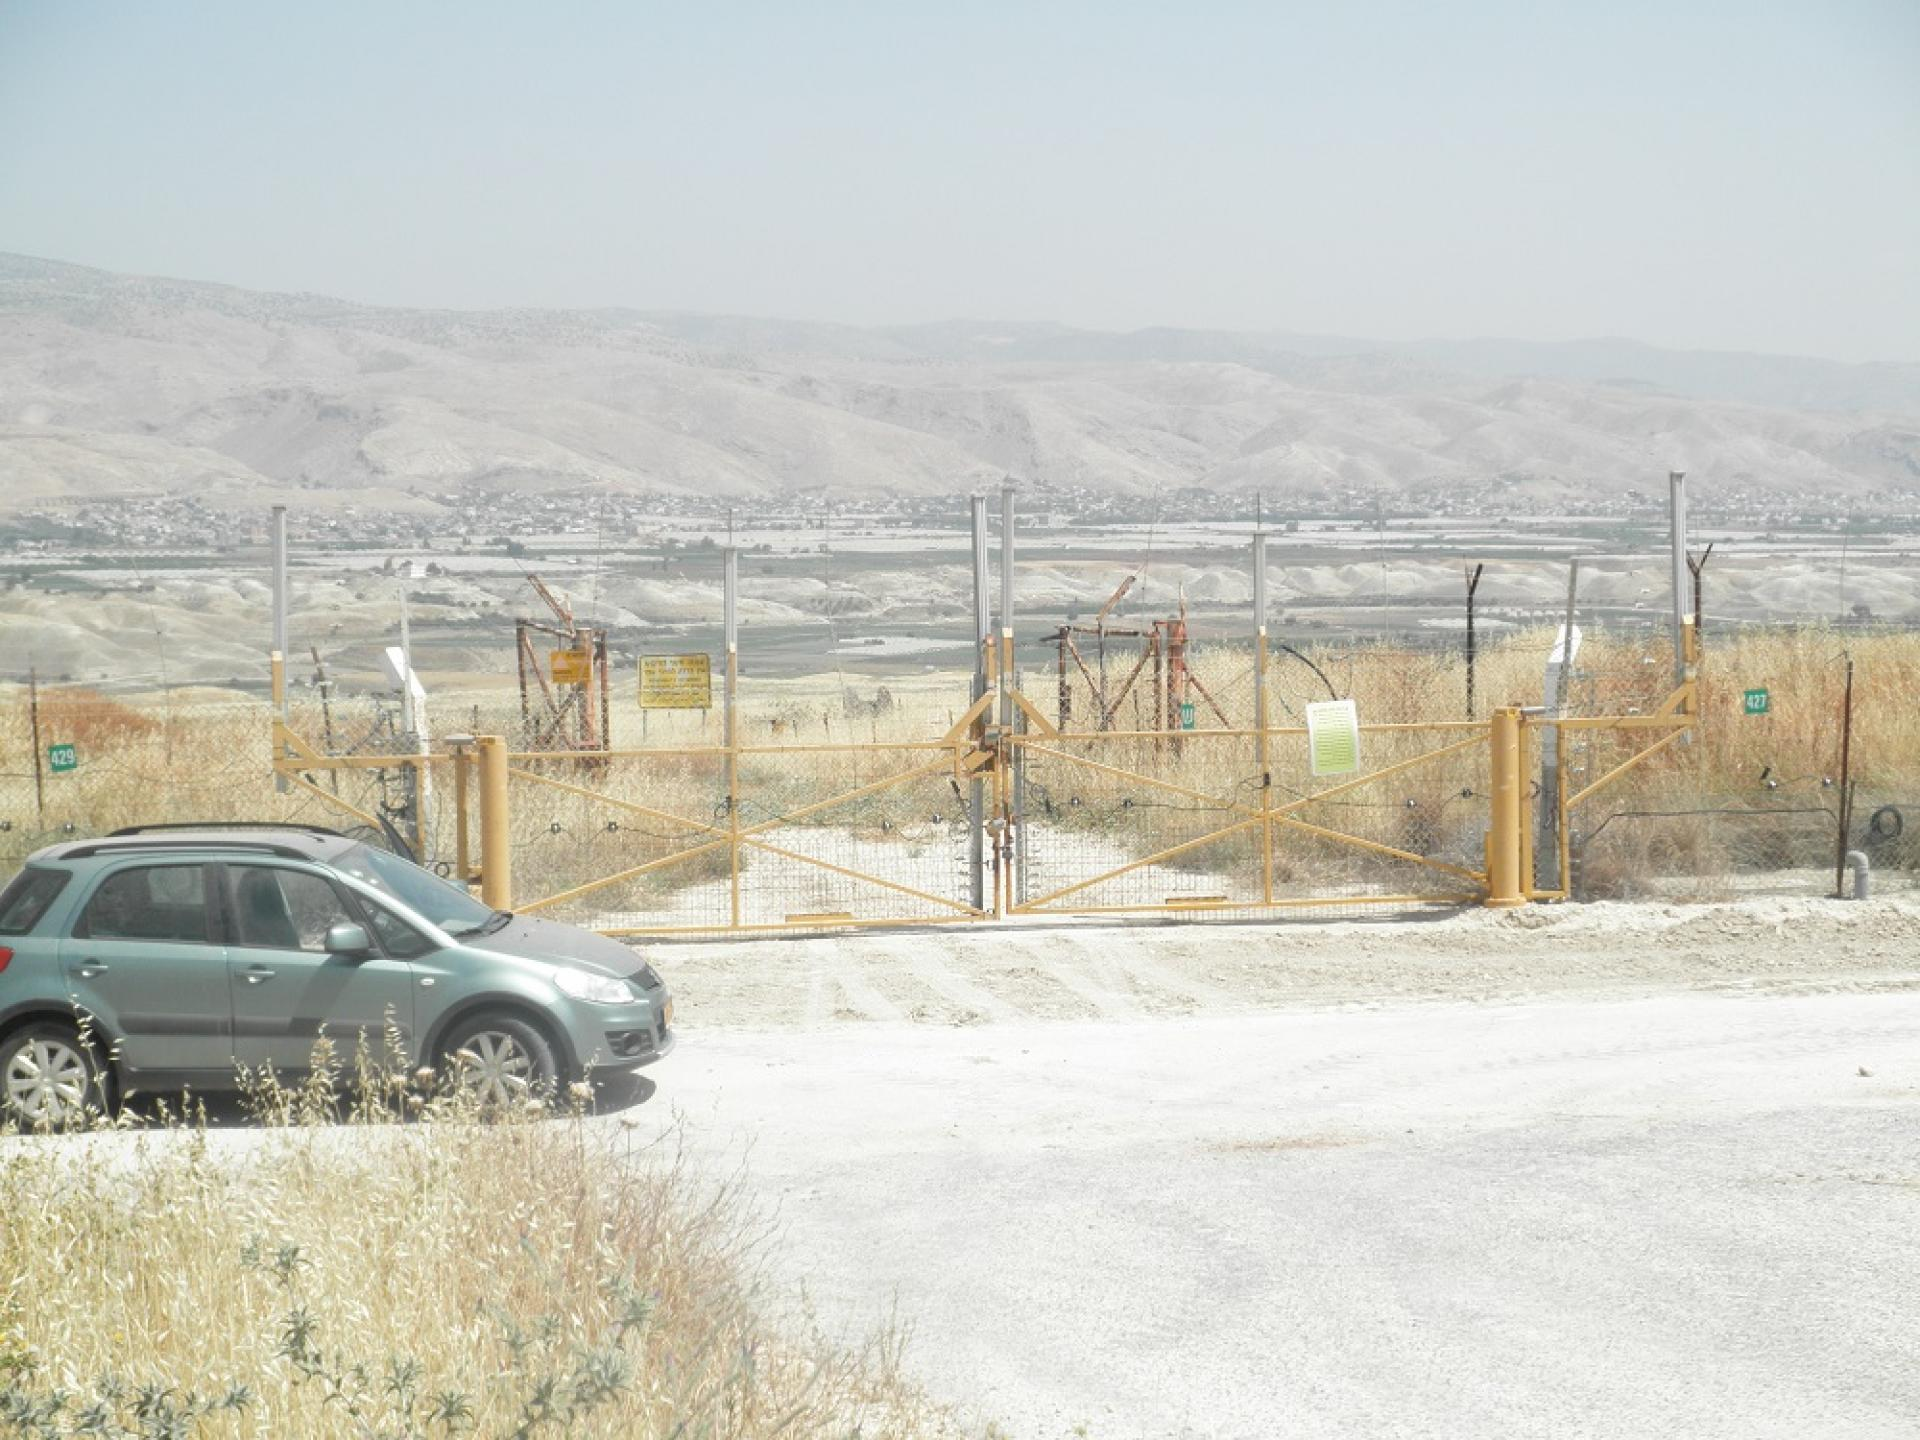 21.4.15 Jordan Valley בקעת הירדן